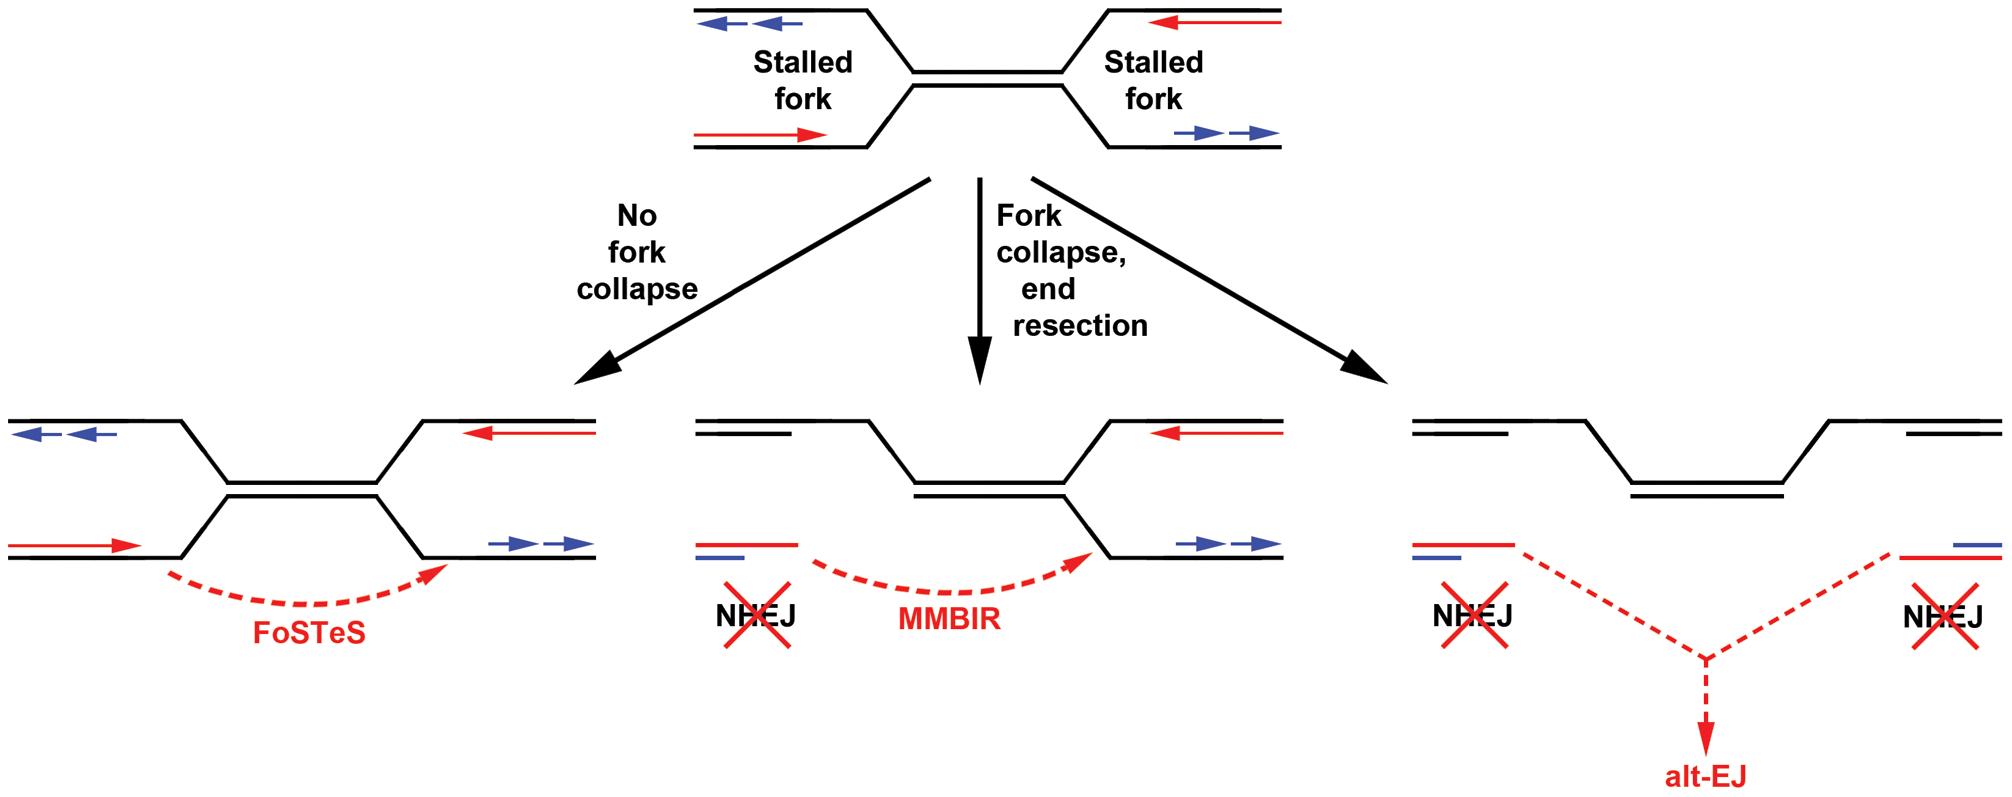 Models for replication-dependent, Xrcc4-independent CNV formation.